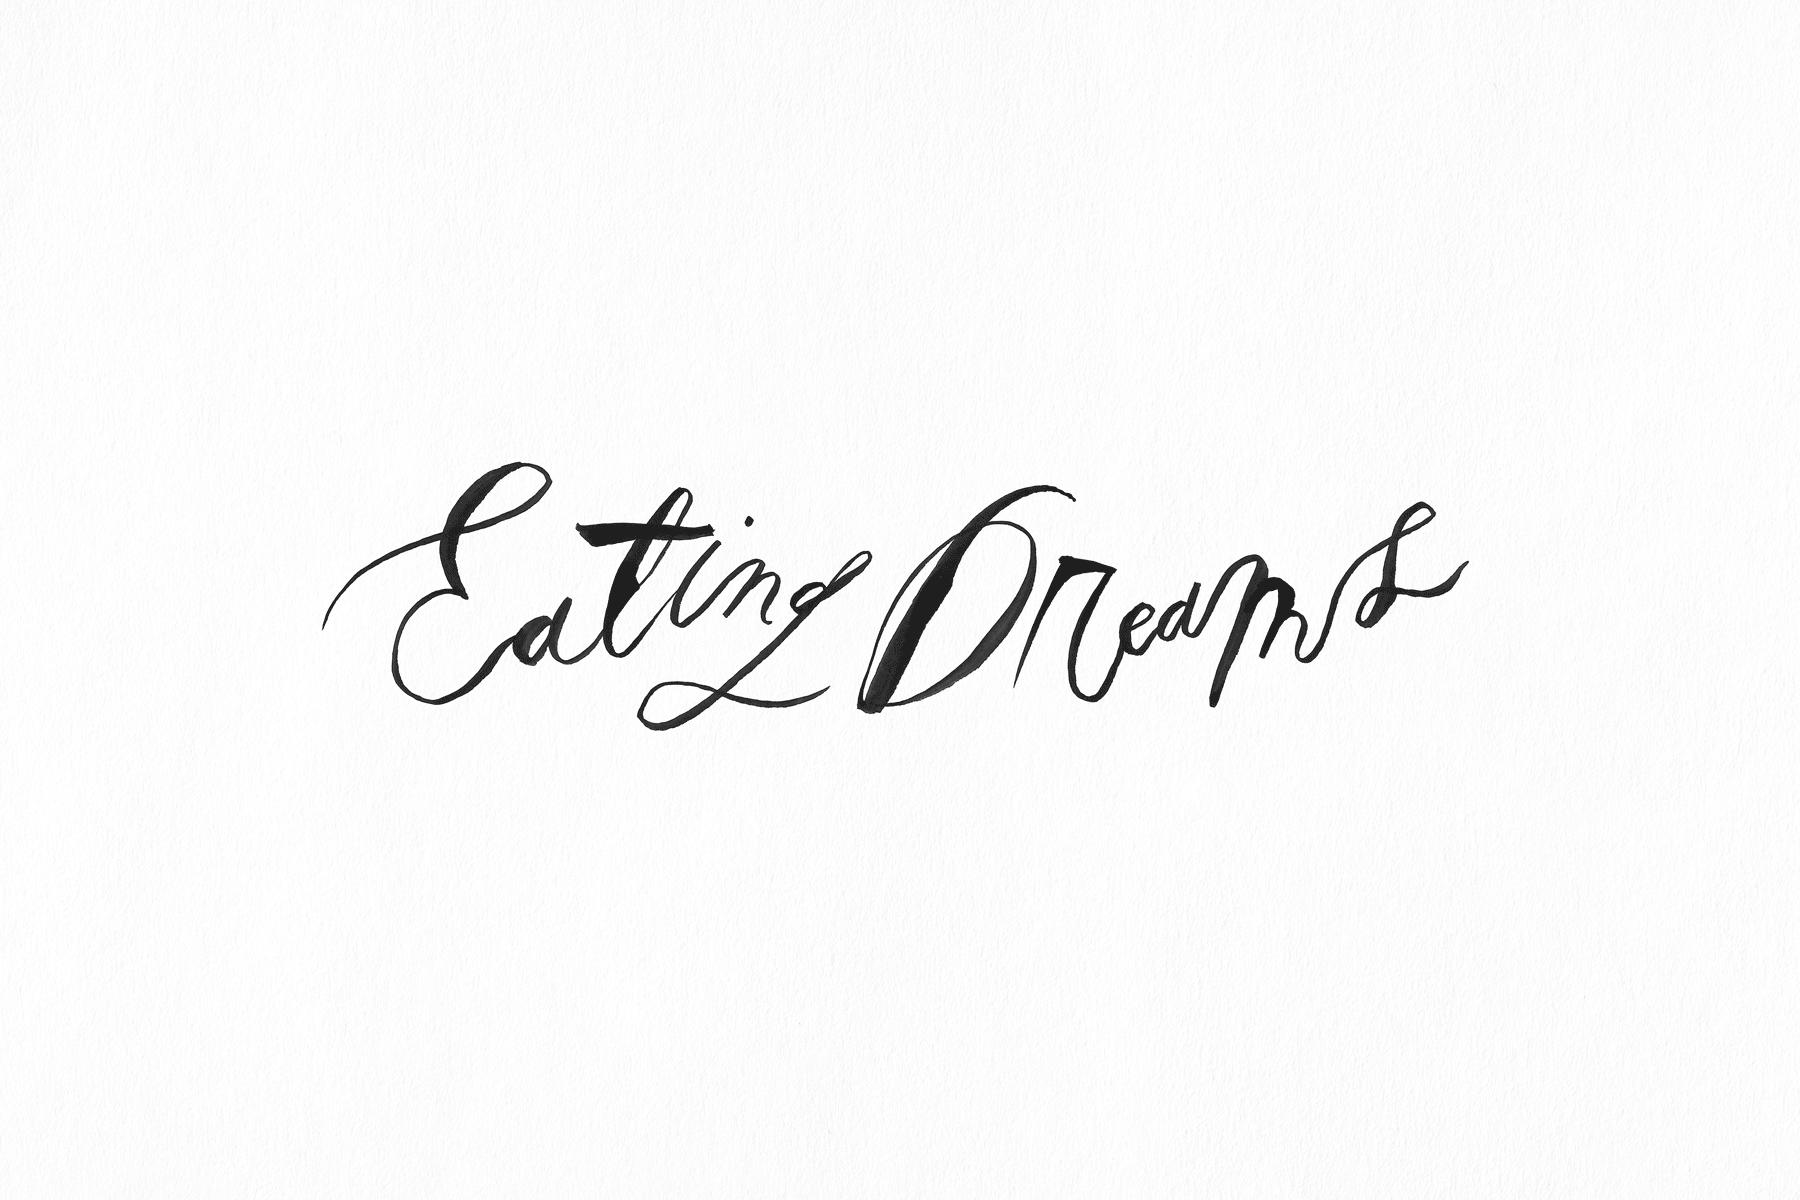 Eating-Dreams_Logo-Design_Rachelle-Sartini-Garner_2.png